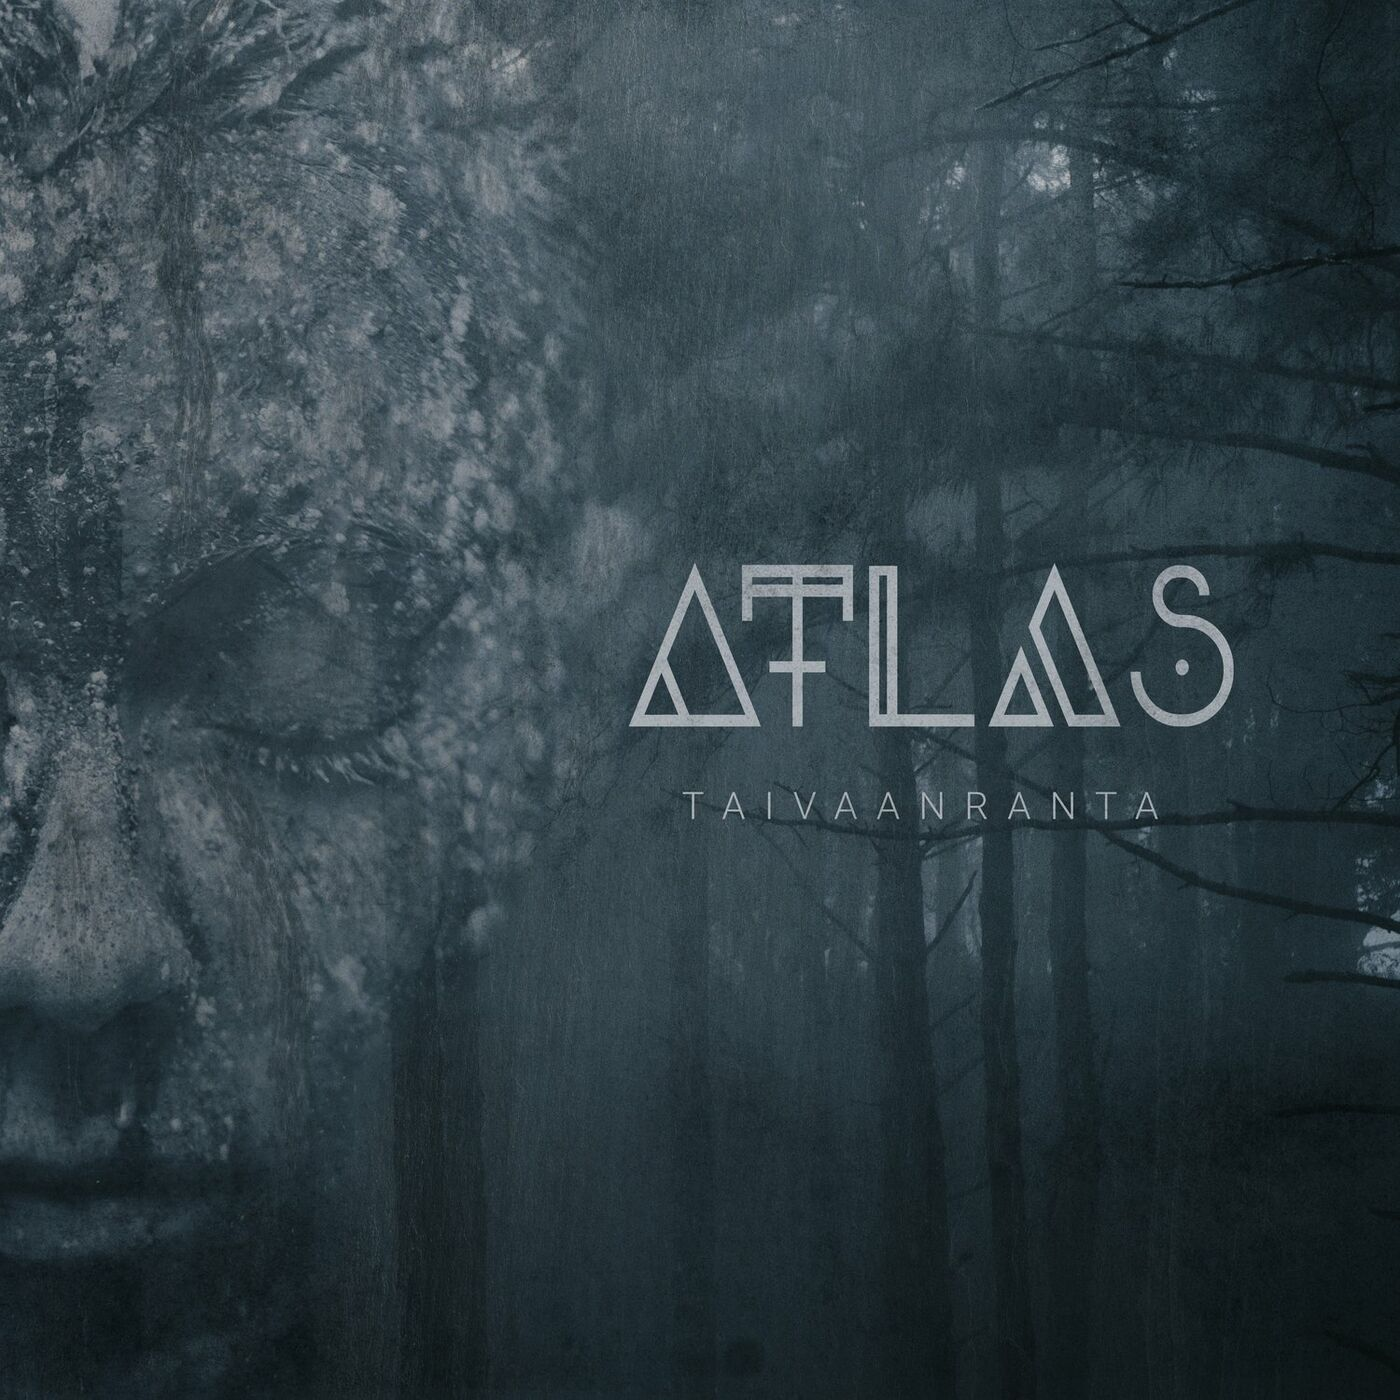 Atlas - Taivaanranta [single] (2021)